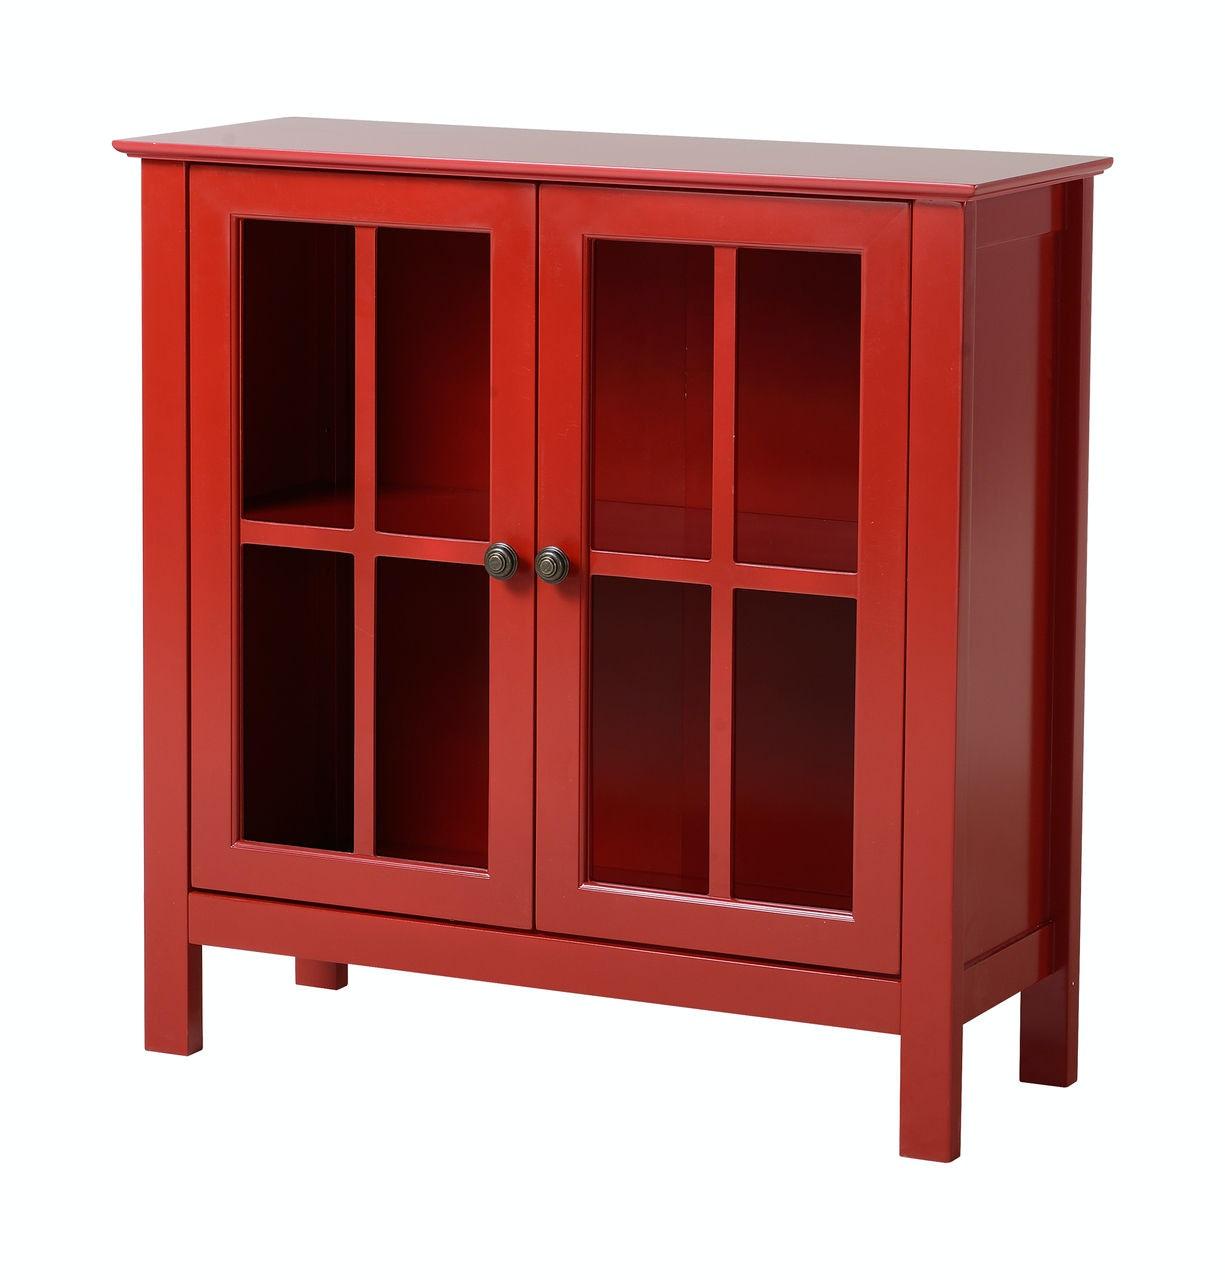 American Furniture Classics Red Glass Door Accent Cabinet 1 22603